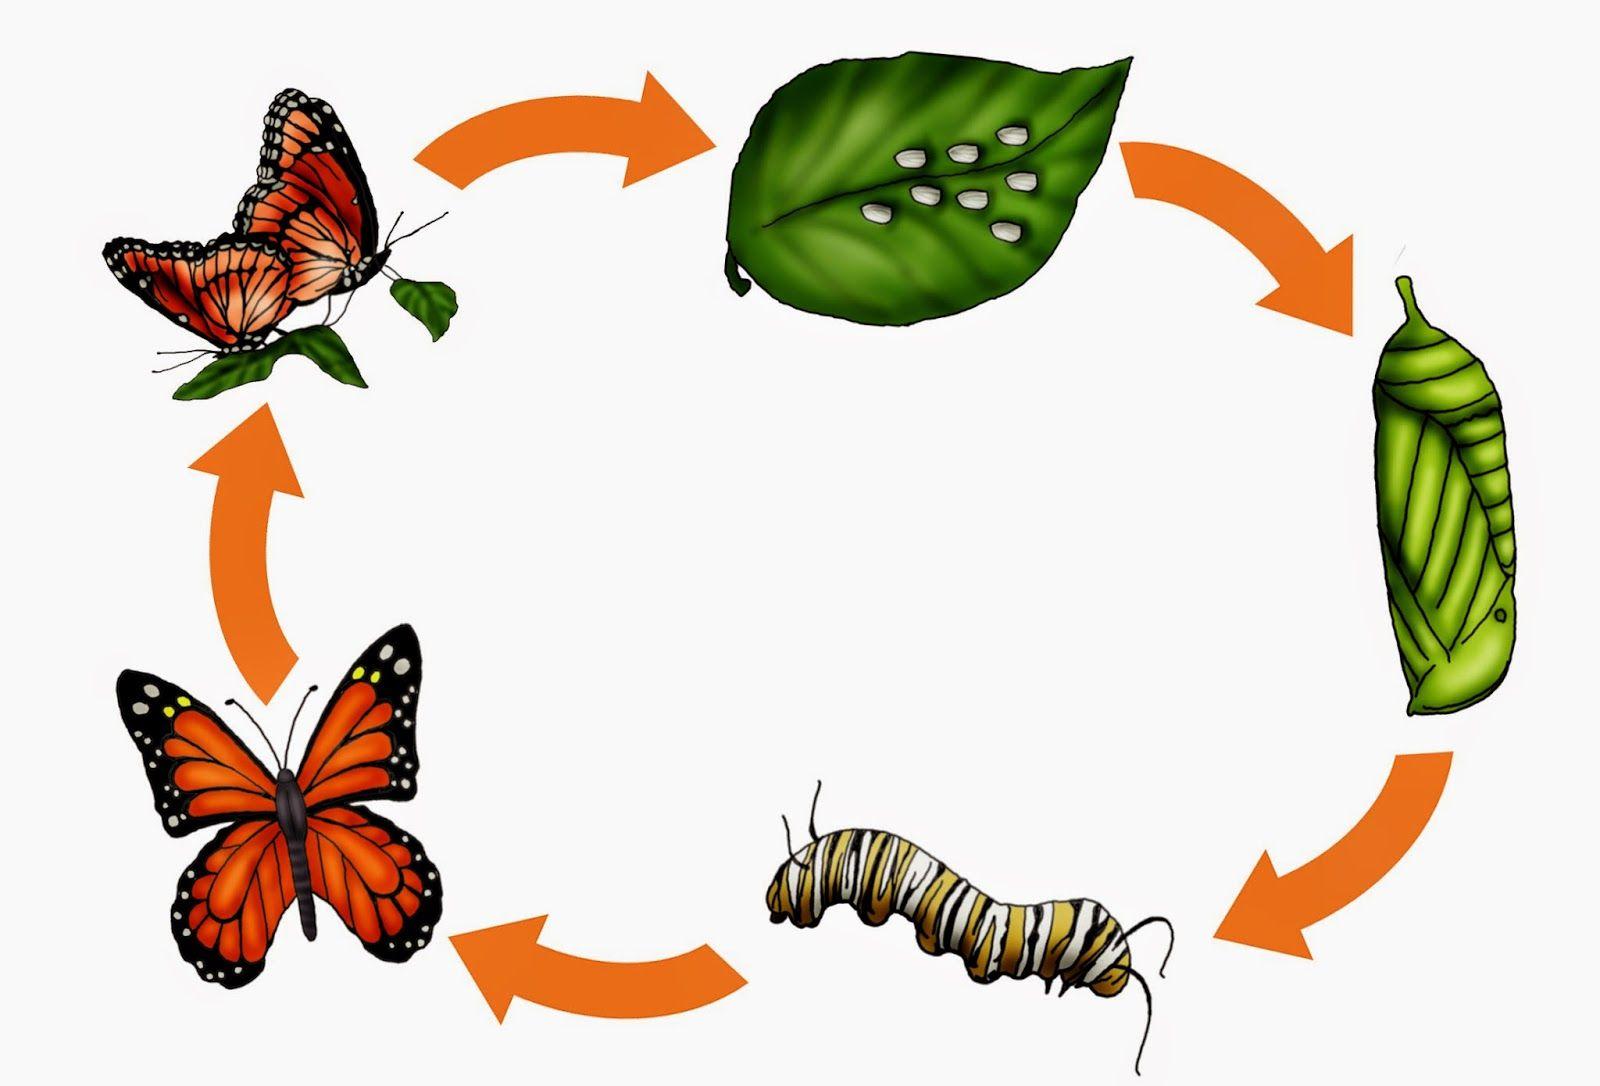 krabbelwiese: Monarchfalter   Insect / Насекомые   Pinterest ...